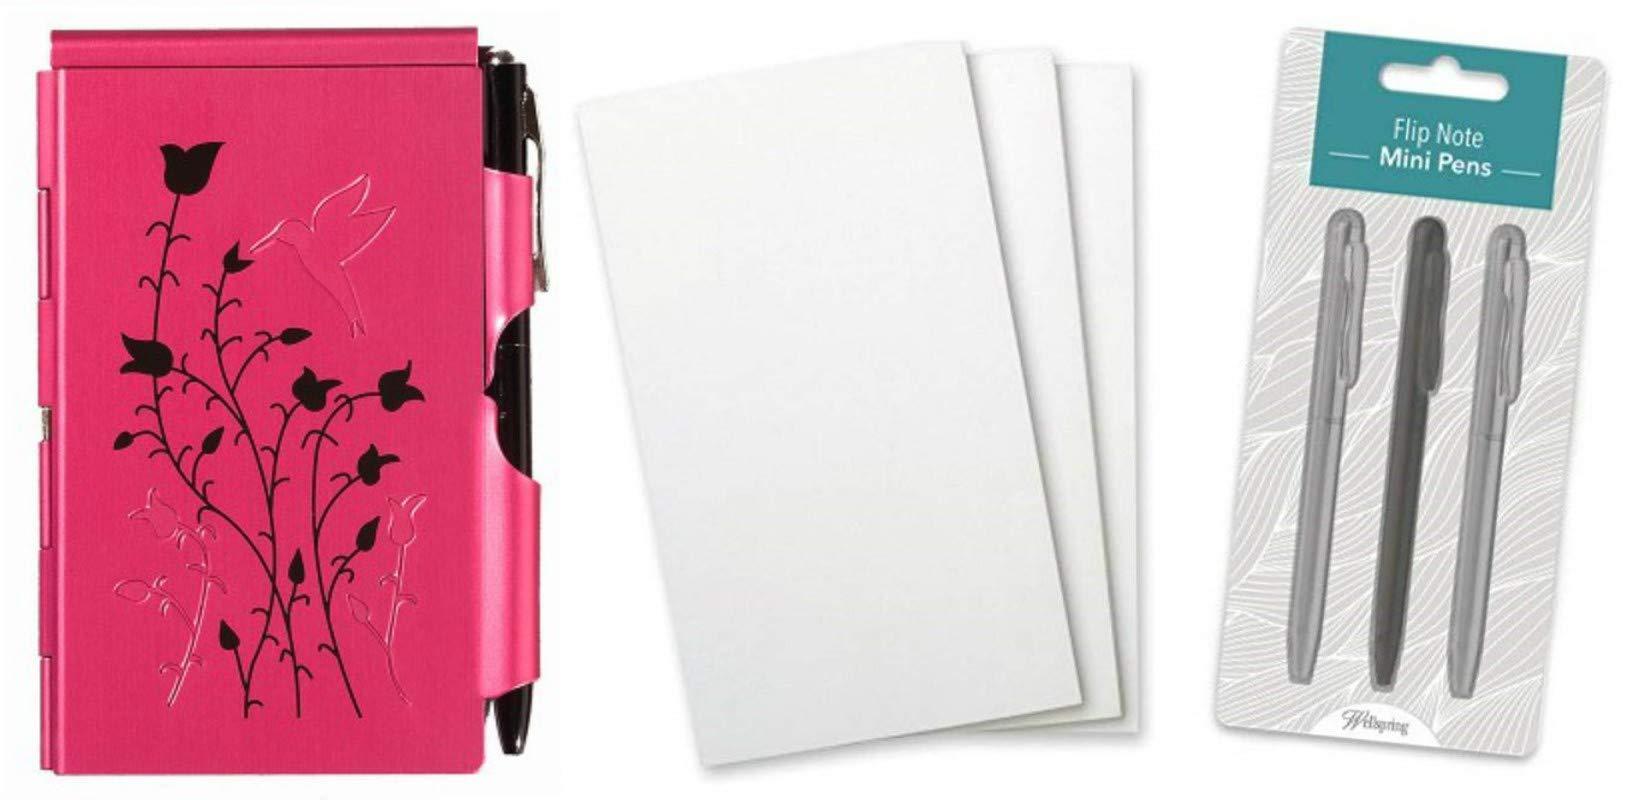 Wellspring Flip Note Notepad Set: Natural Elements Raspberry Hummingbird Flip Note, 3 Flip Note Refill Pads and a 3 Mini Pen Refill